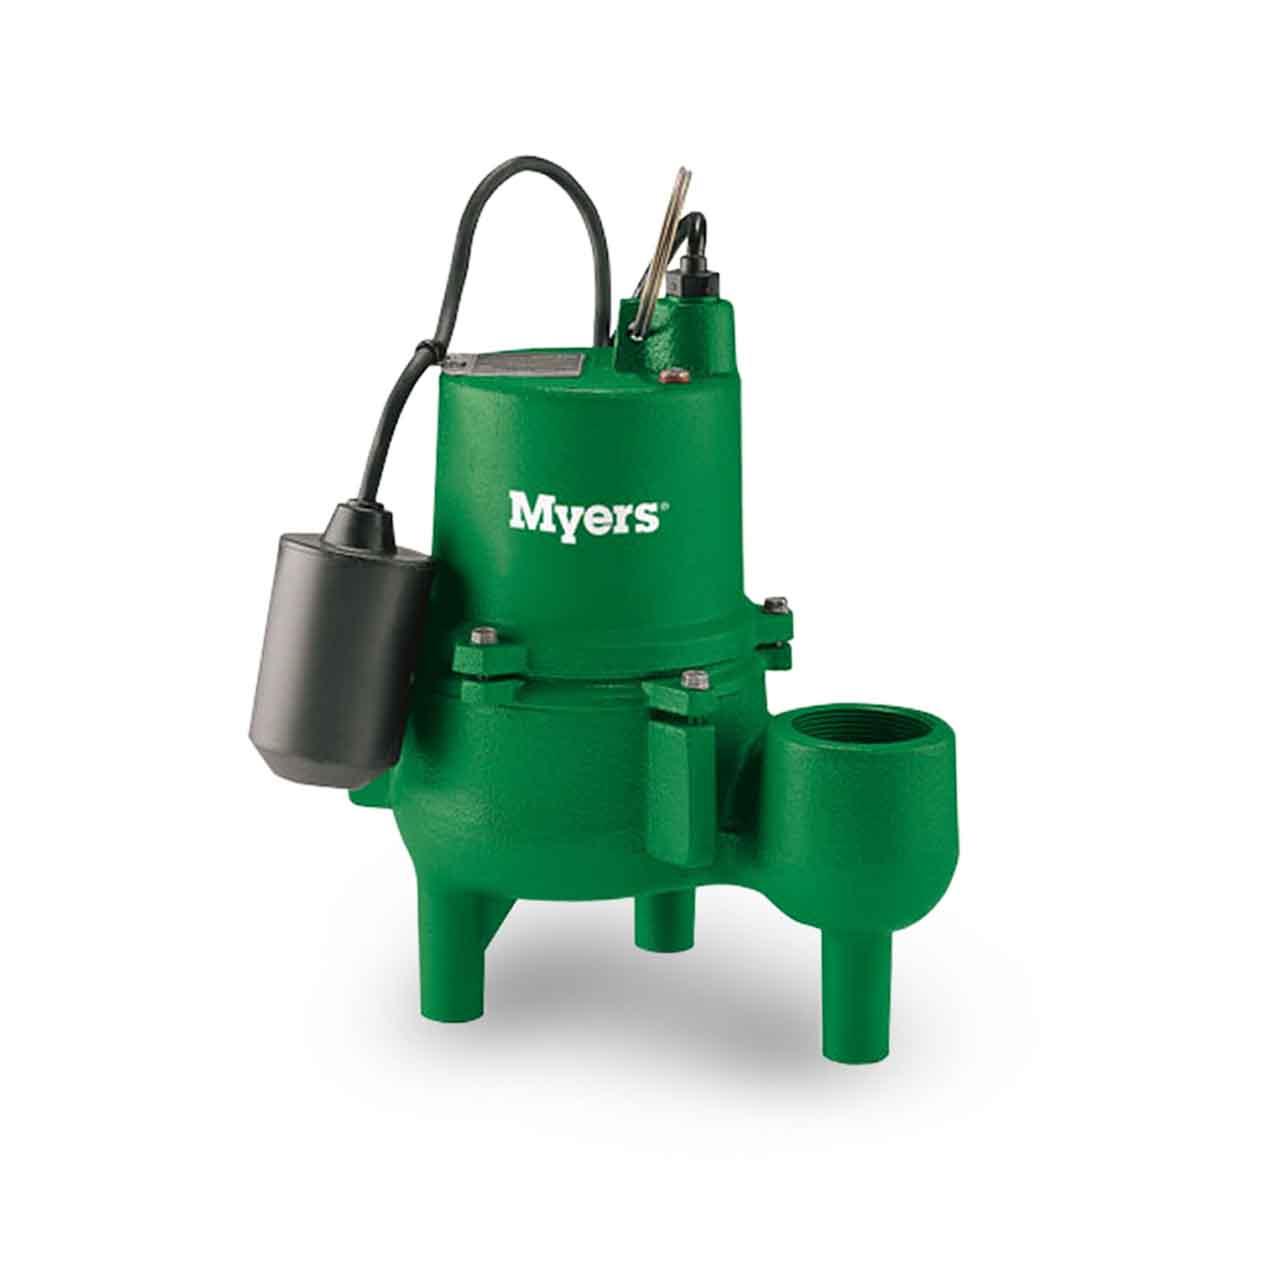 myers myers srmmc sewage pump hp v ph cord manual myers myers srm4m1c sewage pump 0 4 hp 115v 1 ph 20 cord manual myrsrm4m1c